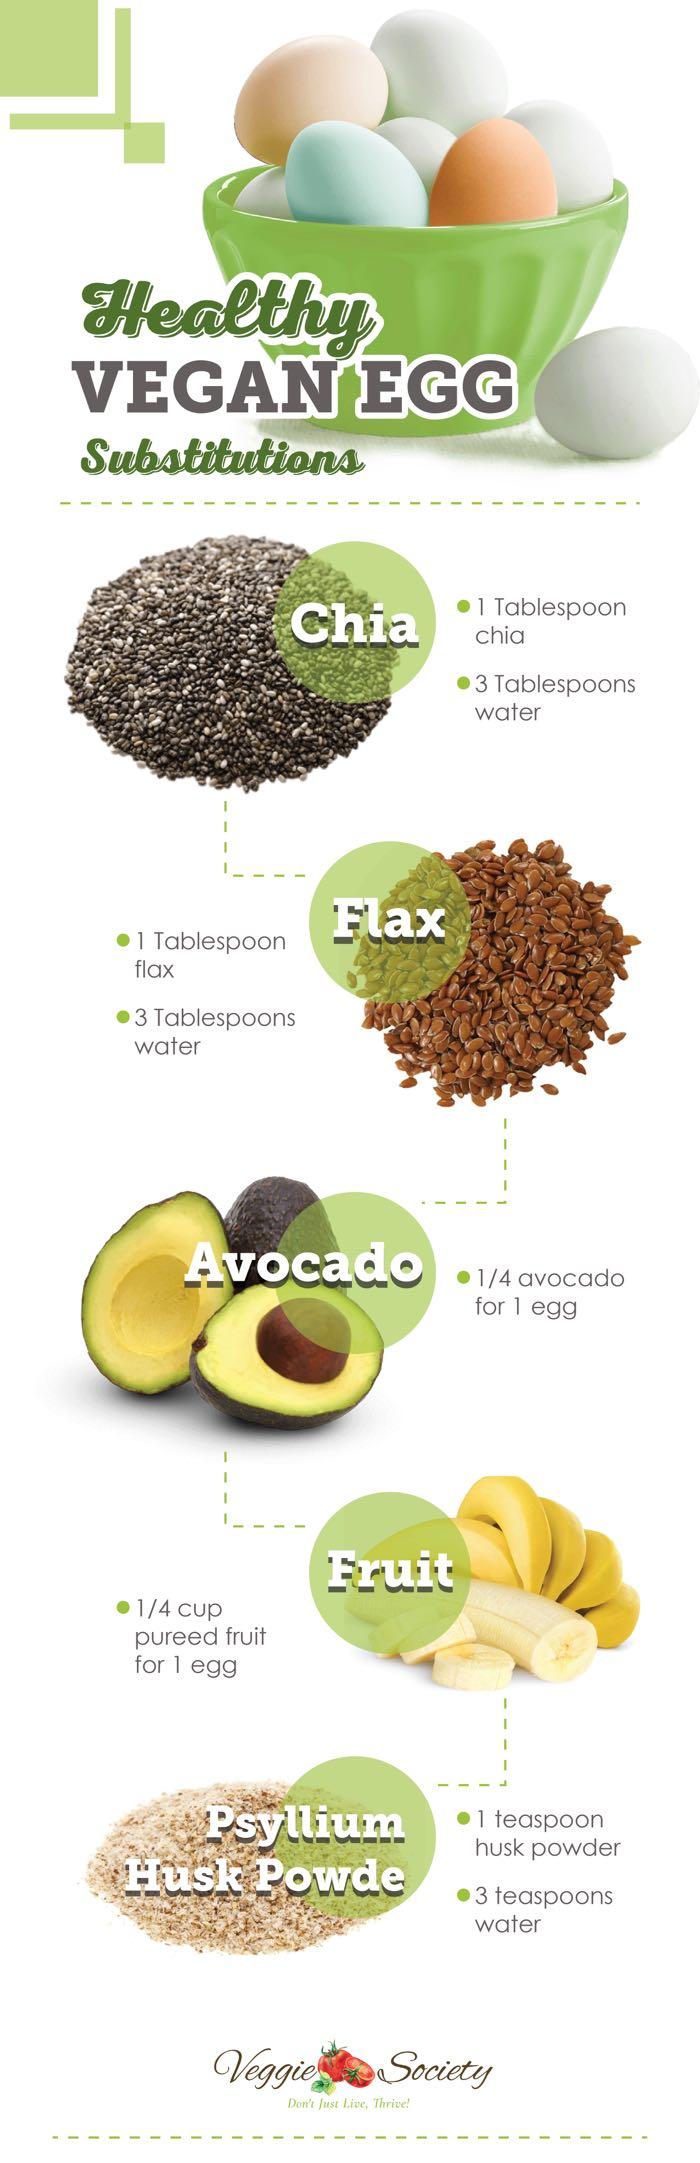 Top Healthy Vegan Egg Substitutes Infographic: chia, flax, avocado, fruit, psyllium husk